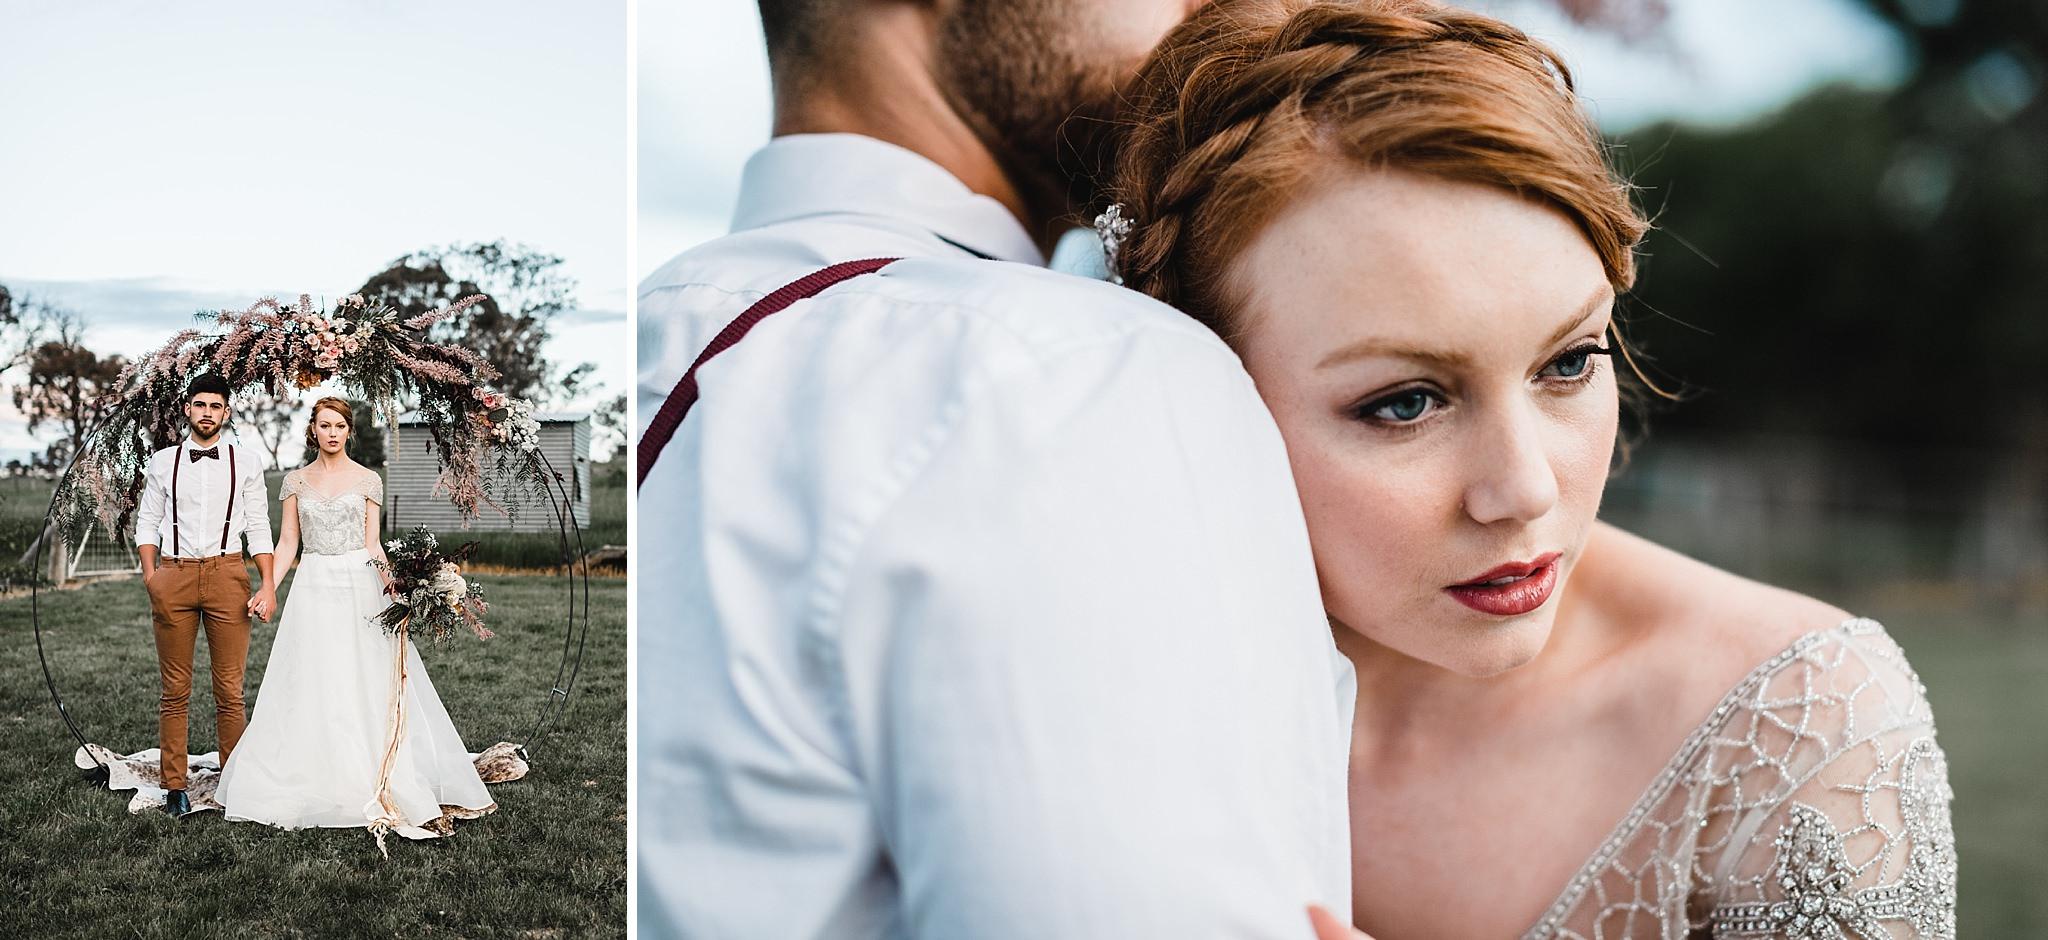 Poachers Pantry, Wedding Inspiration, Canberra Wedding Photographer, Bowral Wedding Photographer, Country Wedding, Rustic wedding bouquet, anna campbell bridal, wren and rabbit, Shae Estella Photo, Wedding photography